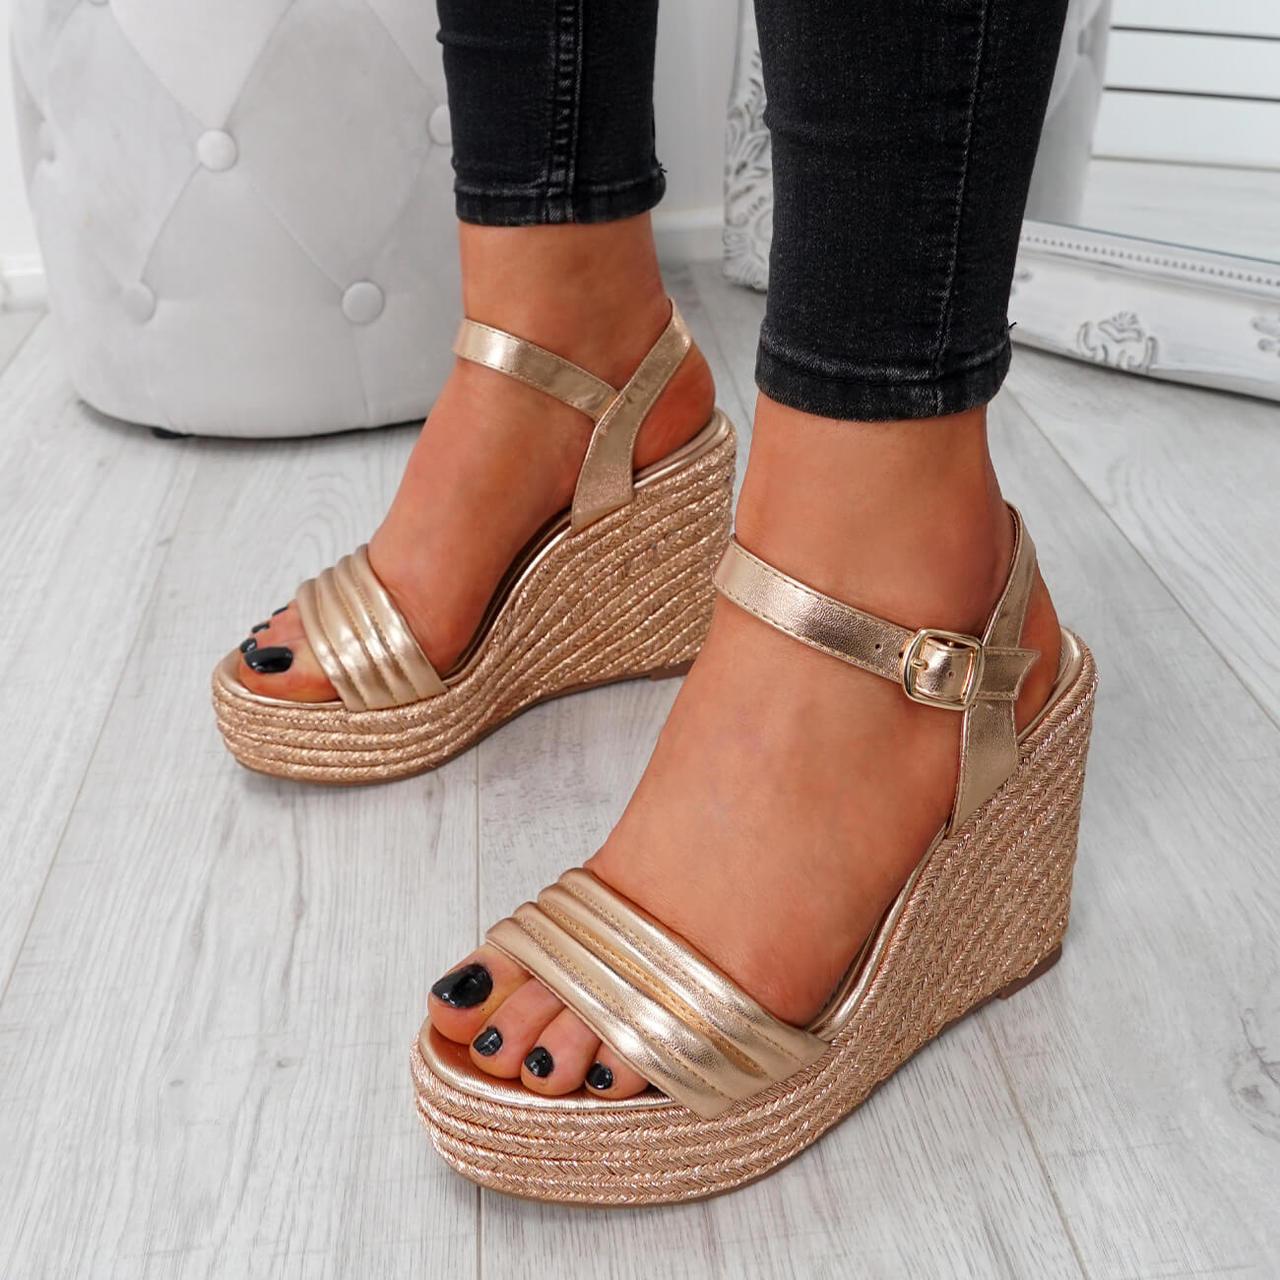 a698db6193ad9 Womens Ladies Ankle Strap Platform Wedge High Heel Sandals Buckle ...